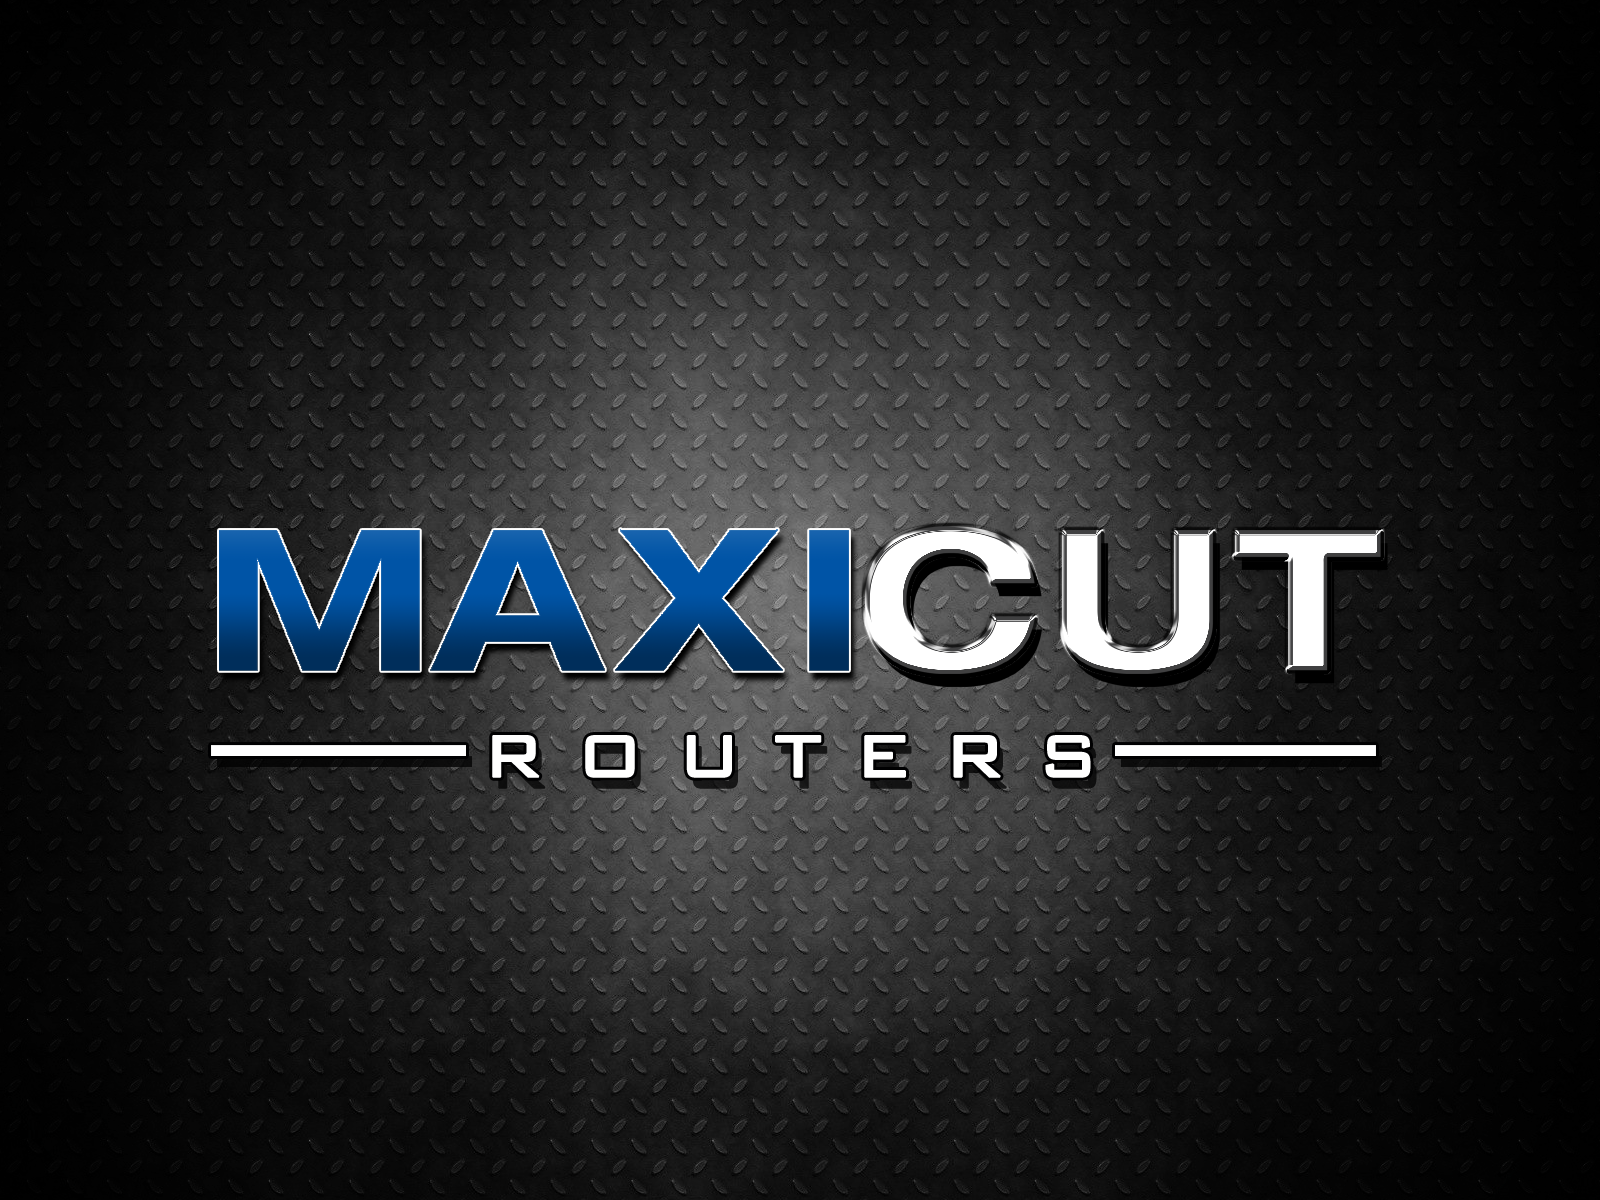 MAXICUT routers - Solid Carbide Routers Designed For Use on Composites, Woods, Plastics & Aluminium